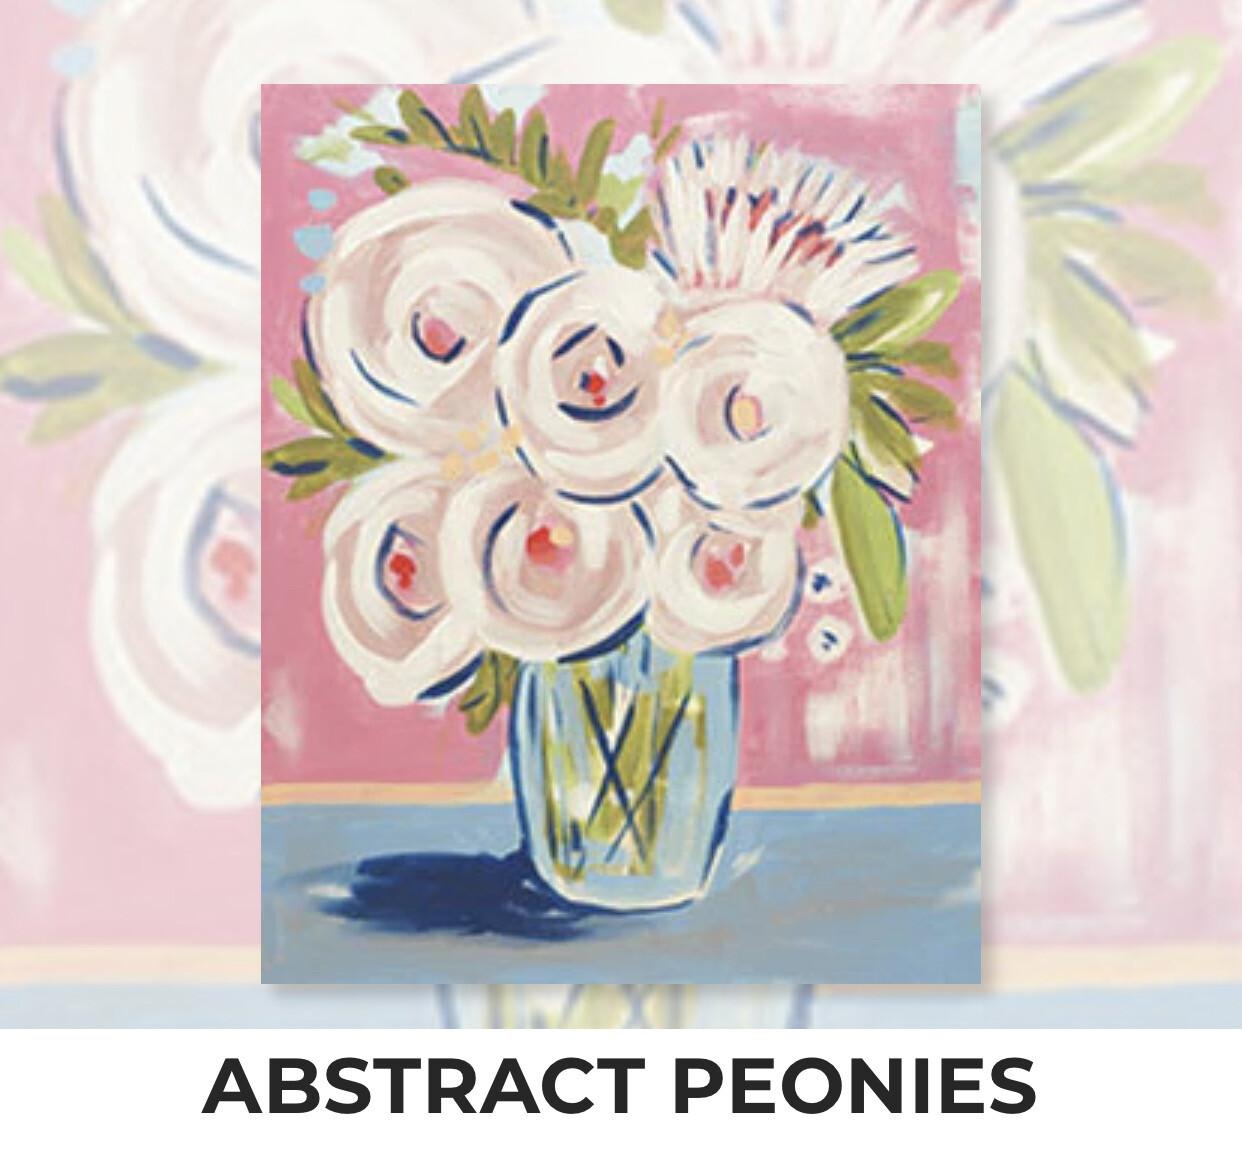 Abstract Peonies ADULT Acrylic Paint On Canvas DIY Art Kit